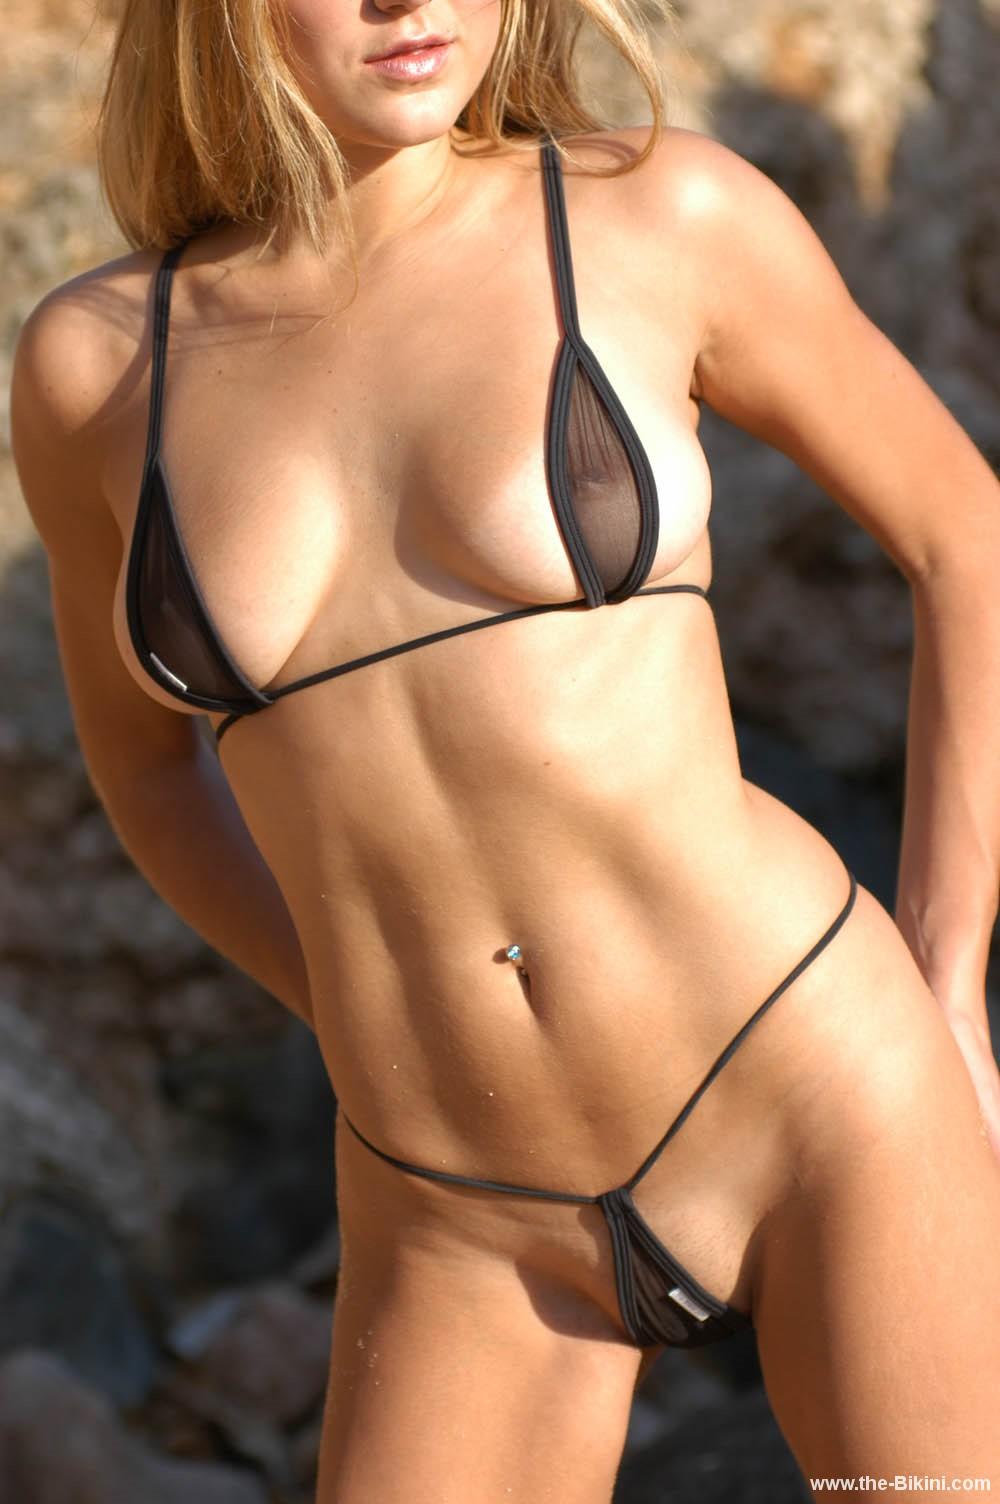 Sexy sheer micro mini lingerie bikini